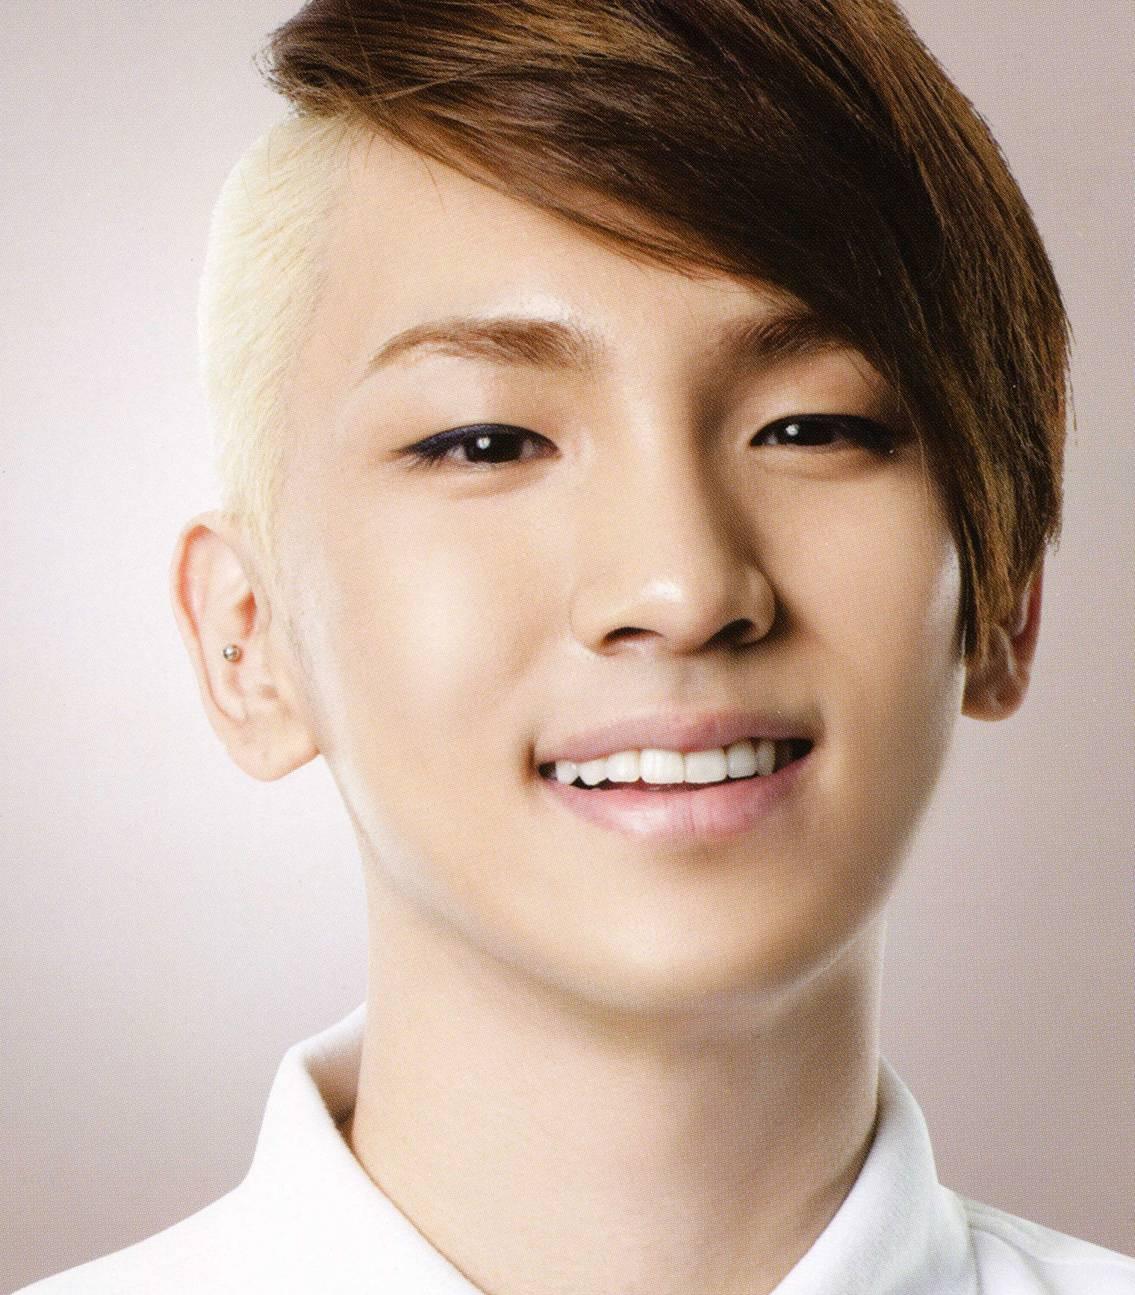 Korean Hairstyles Key Shinee Korean Hairstyles